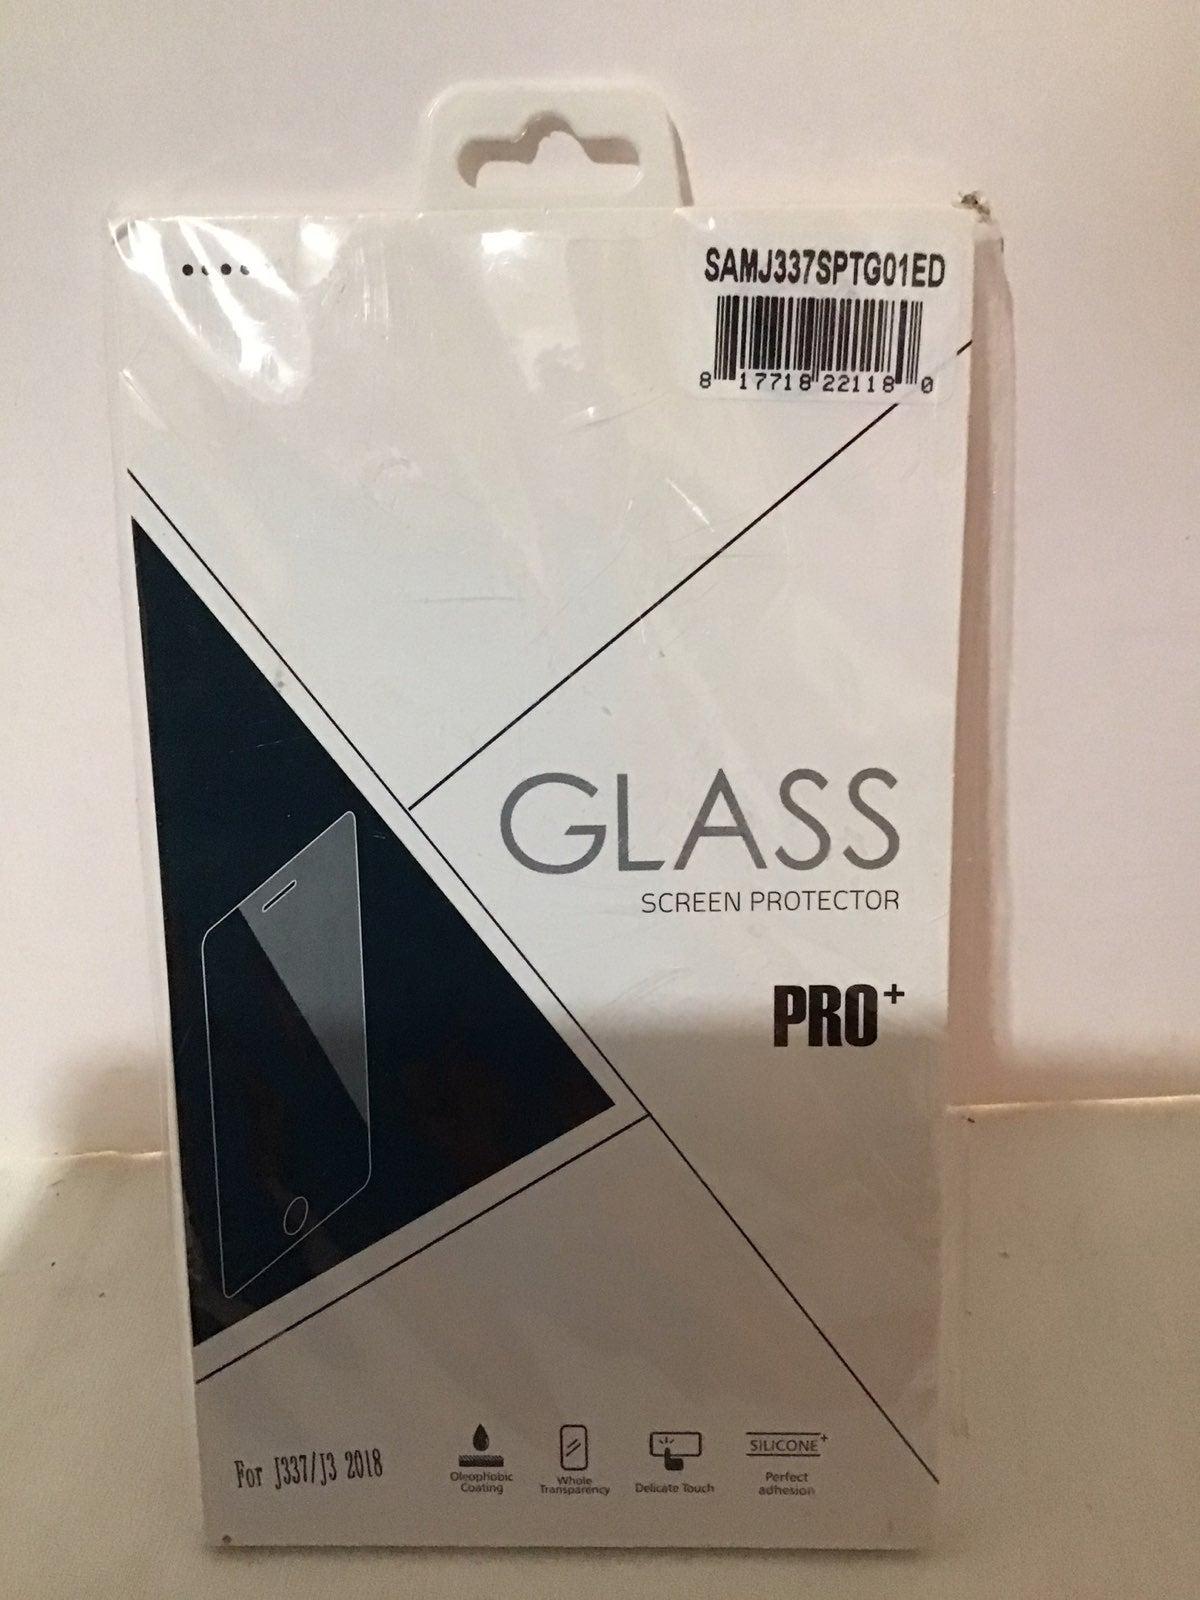 Glass Protector Pro for samsung j337/j3